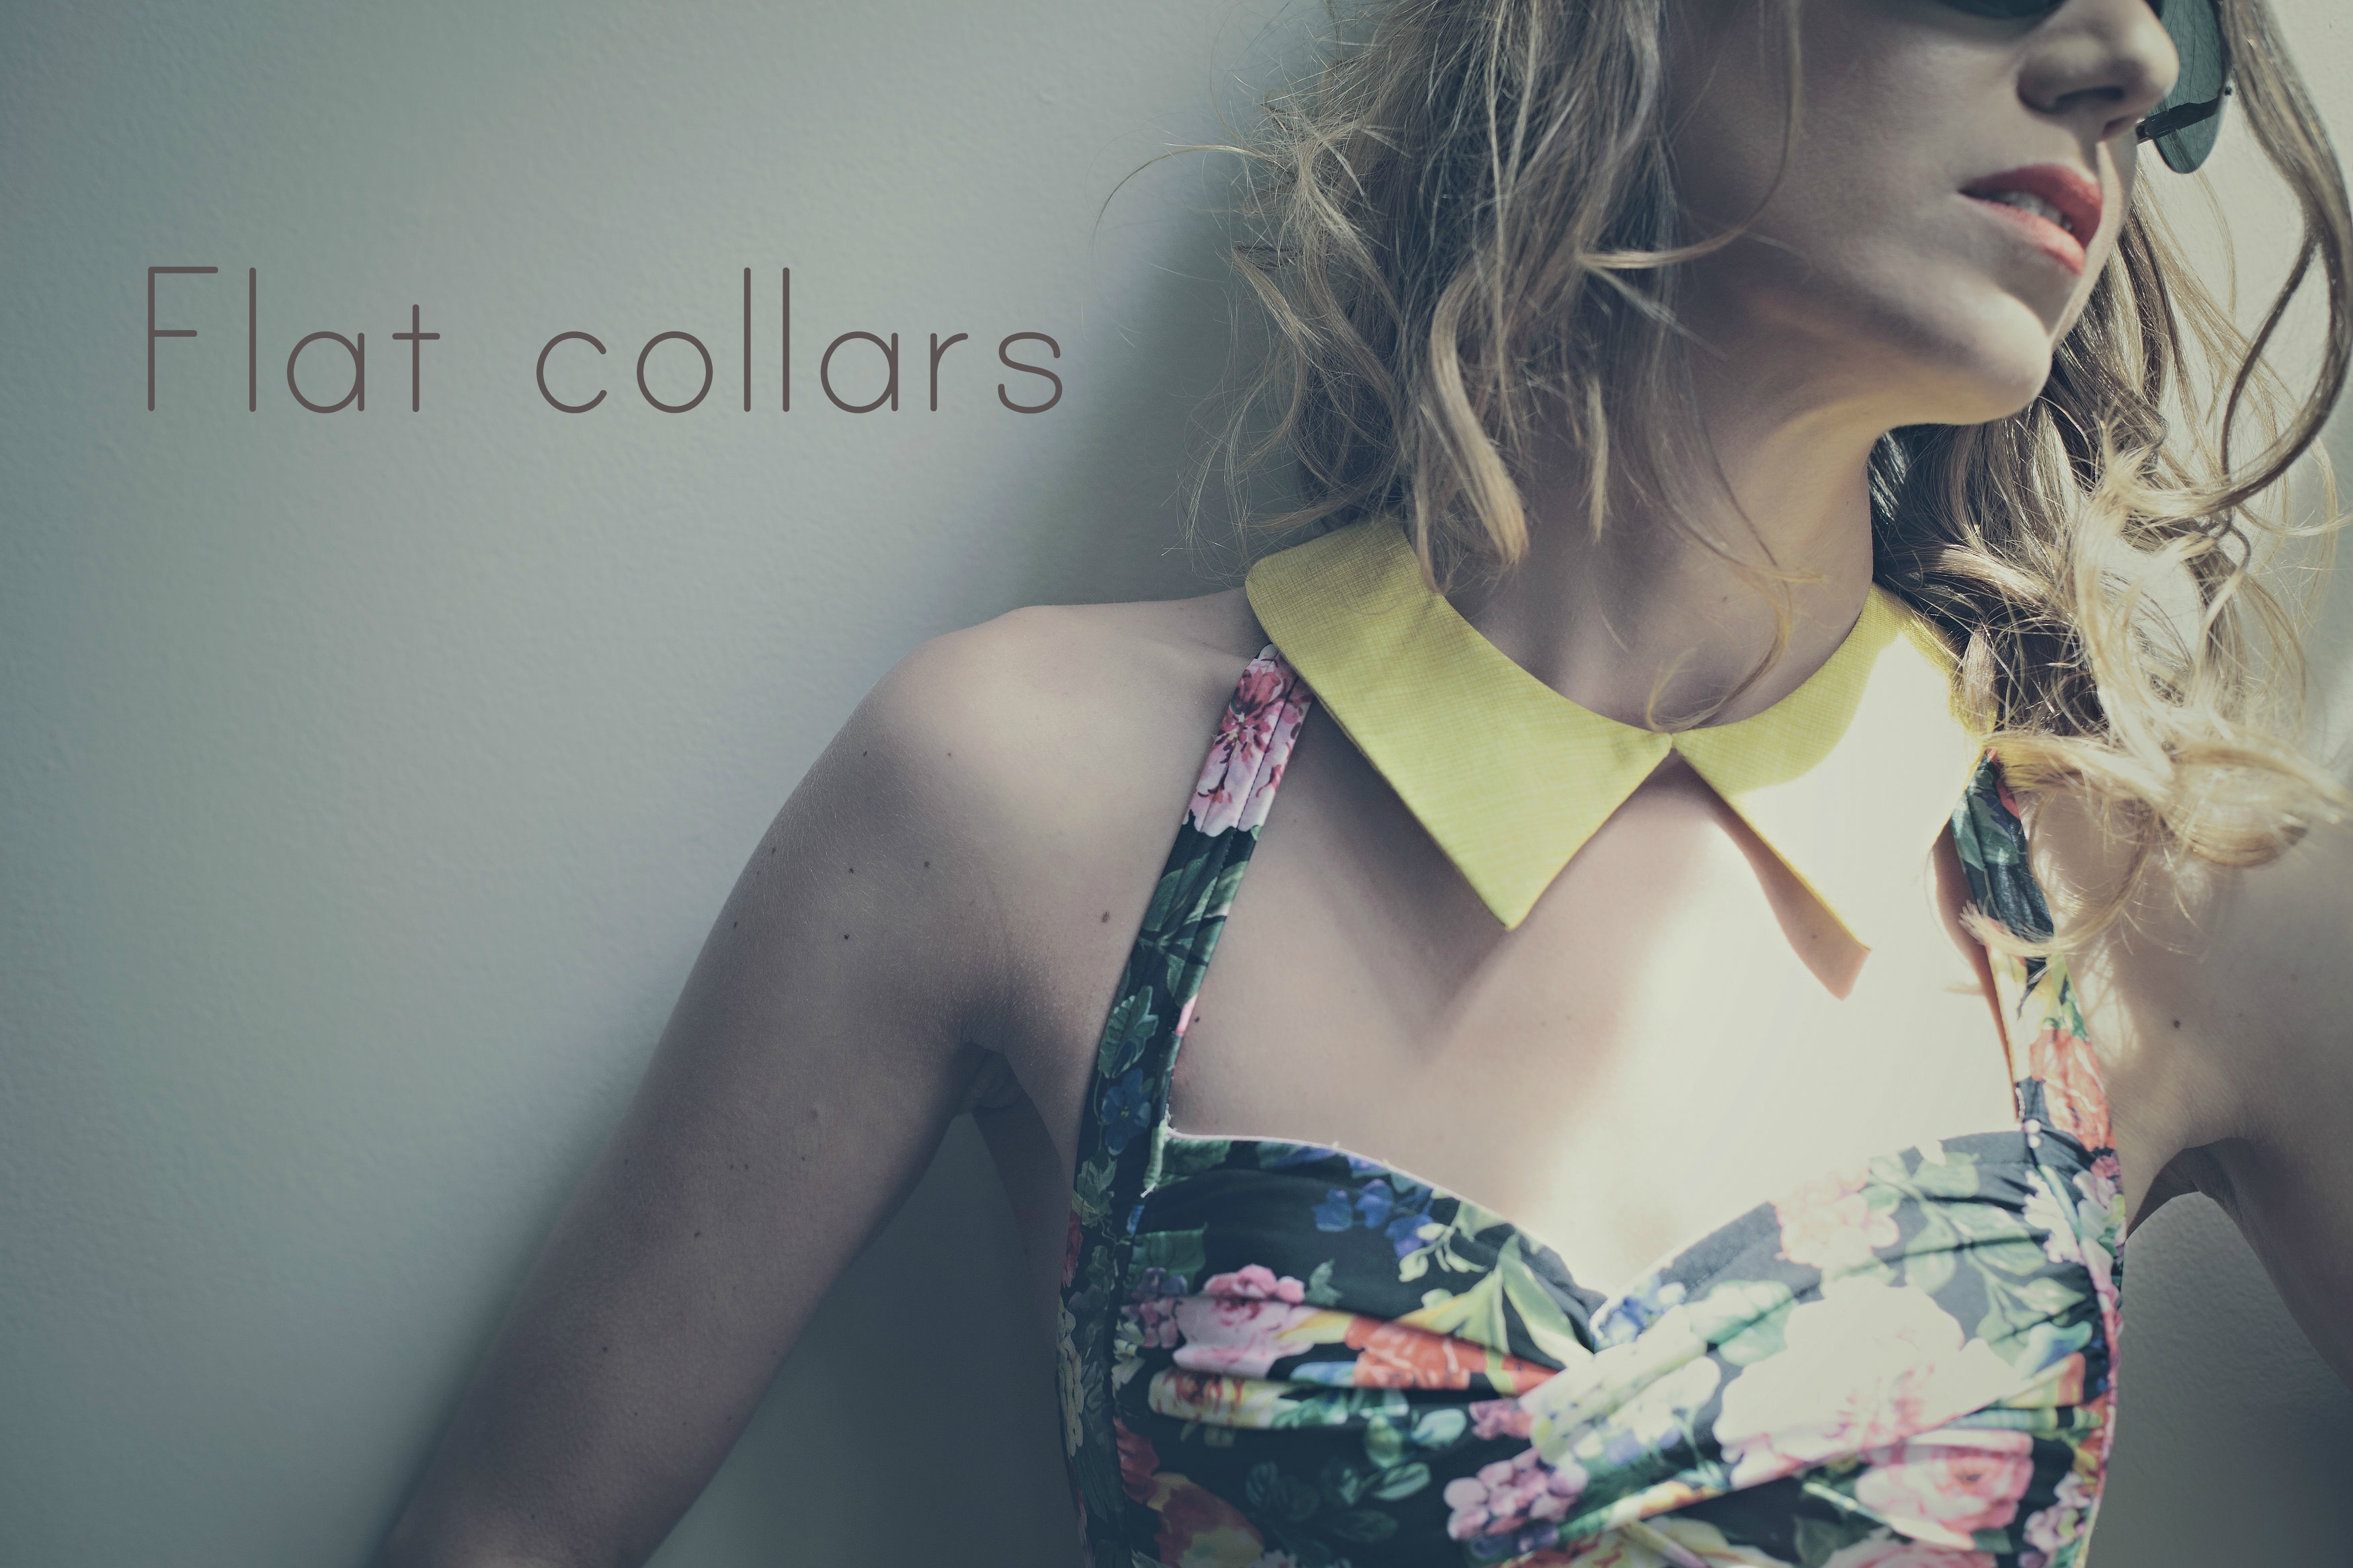 flat collars ali